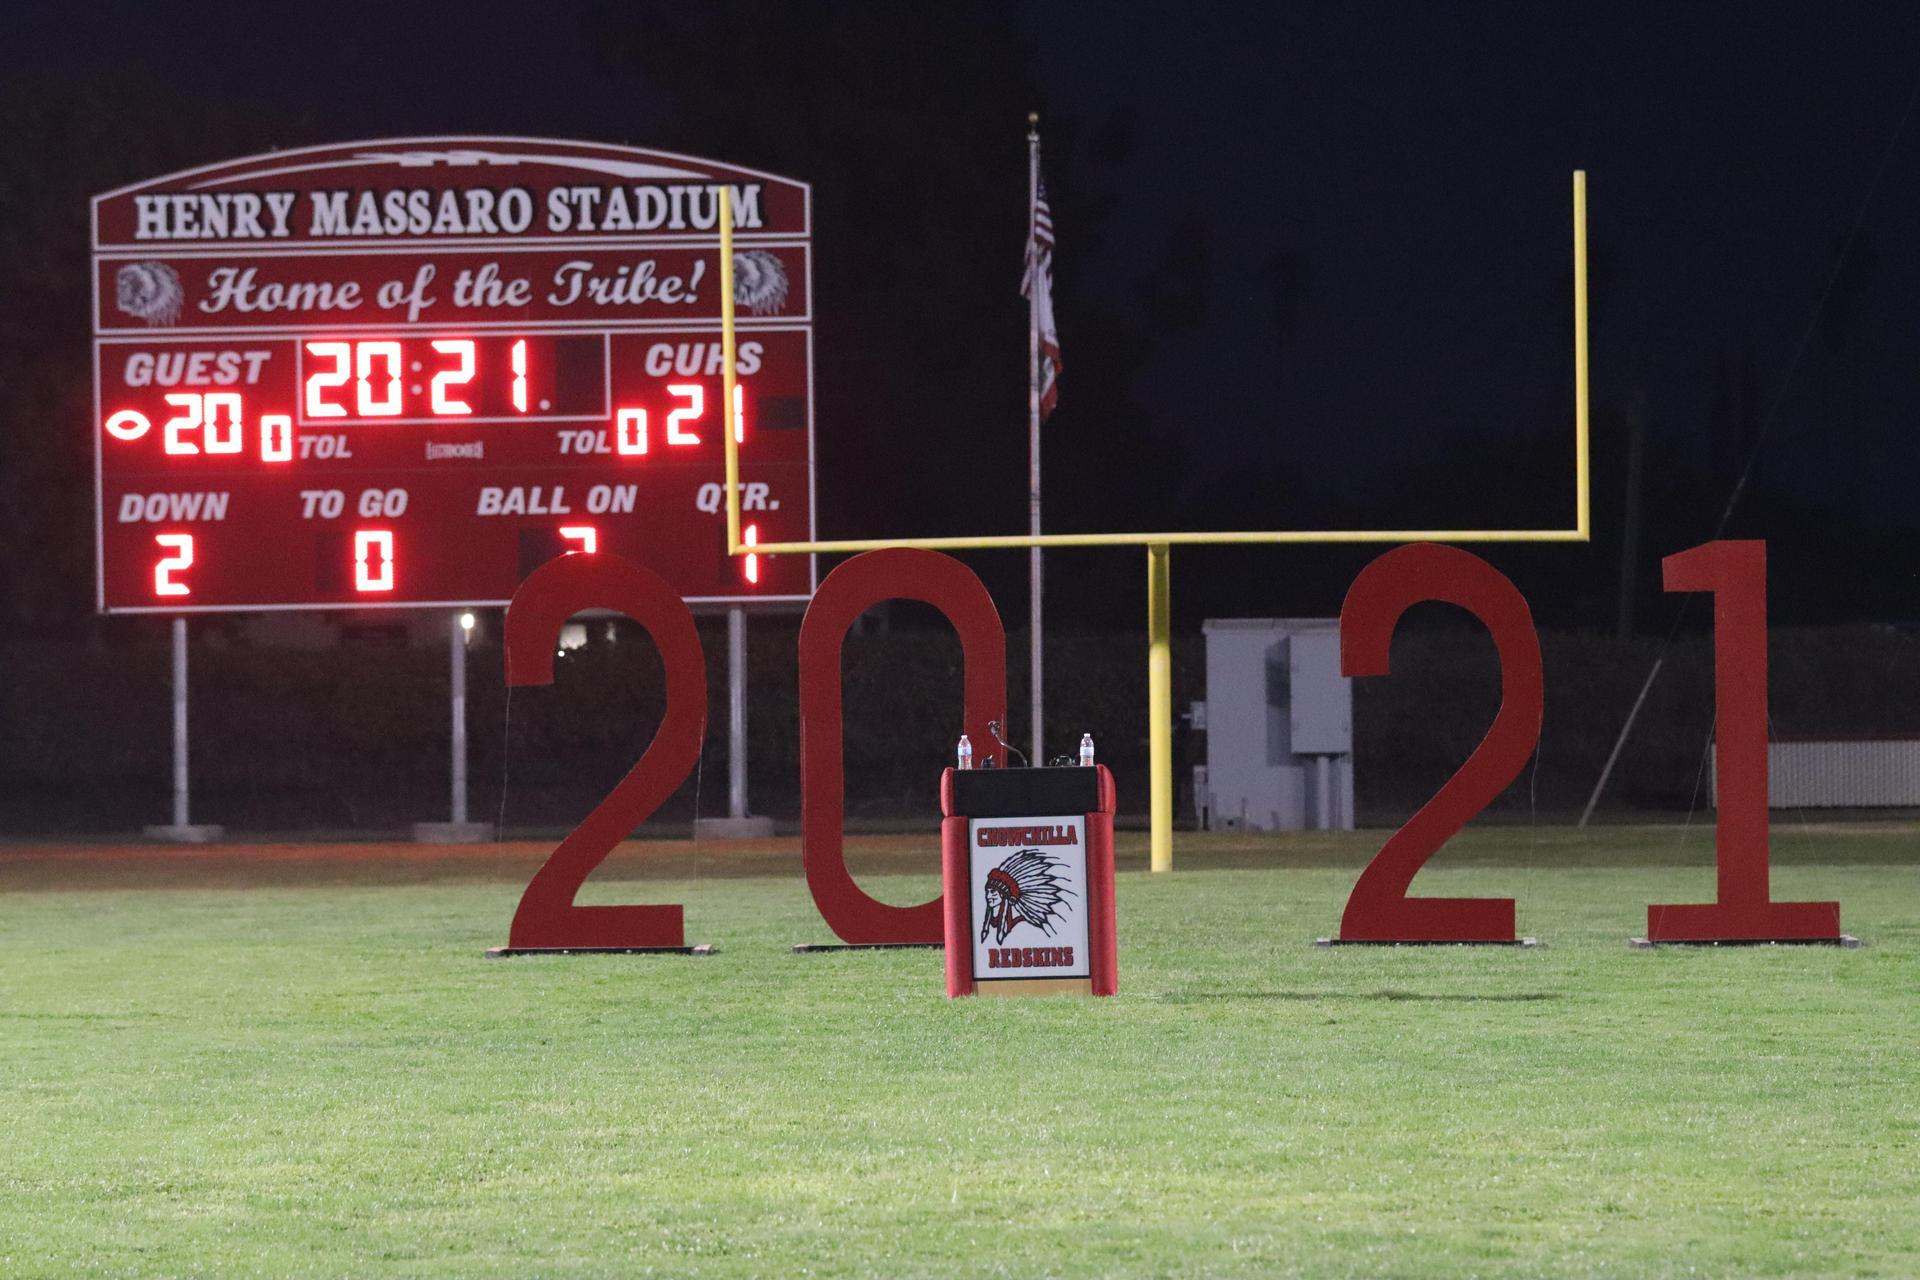 the scoreboard shows 2021